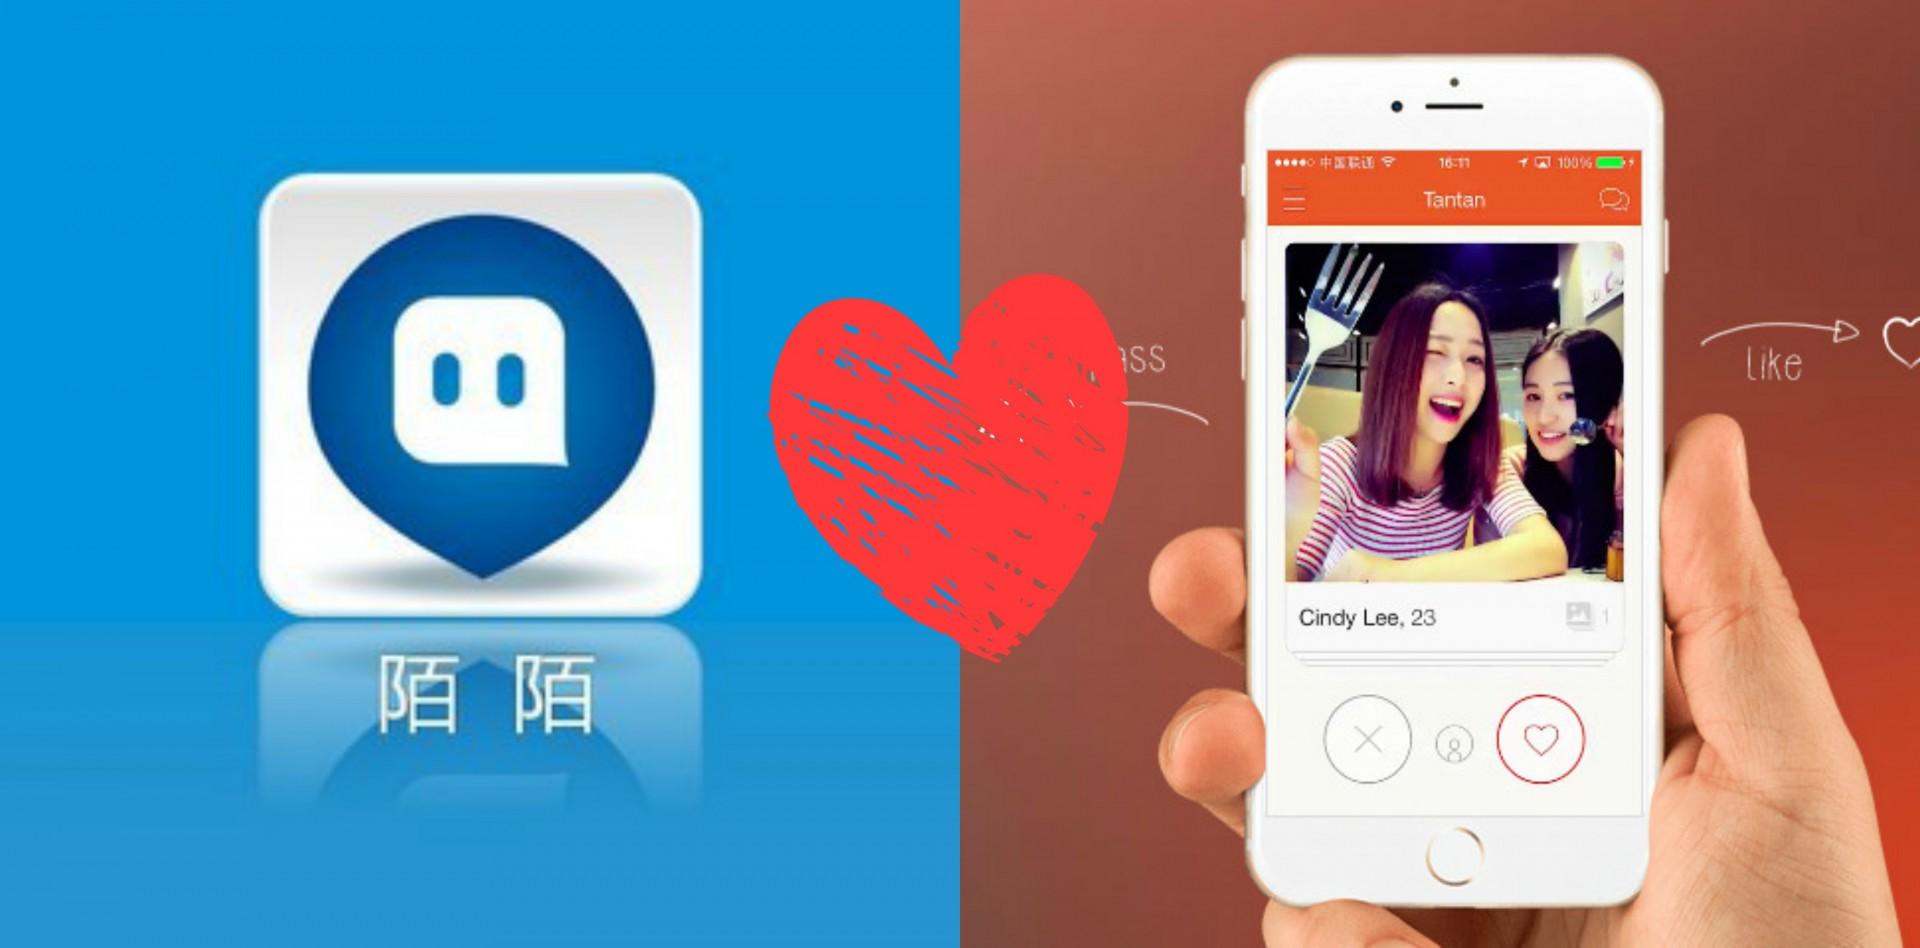 Virtual gift sales drive dating app Momo's Q3 revenue growth